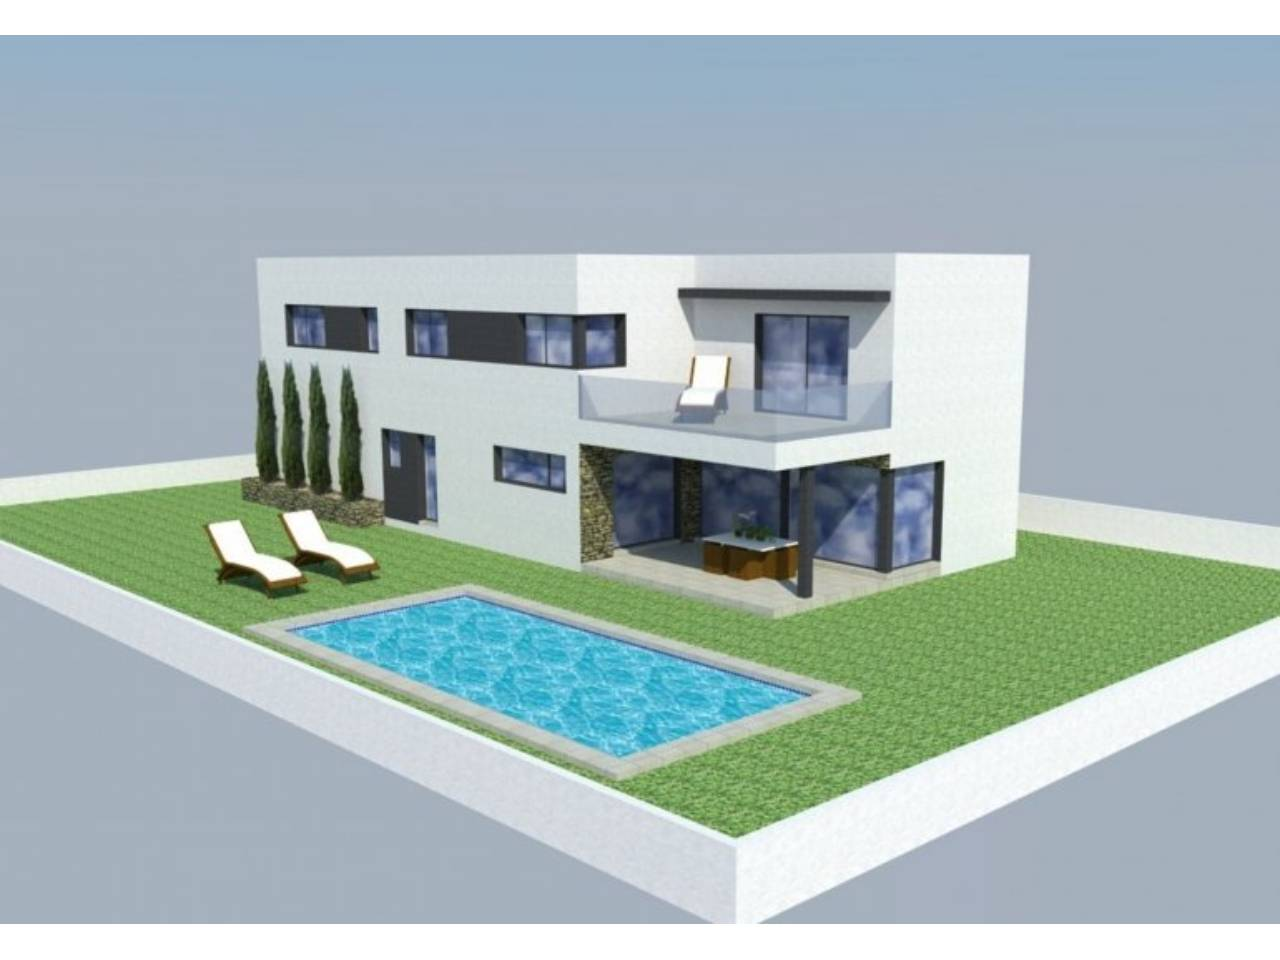 060547 - GARRIGUELLA House model GARRIGUELLA